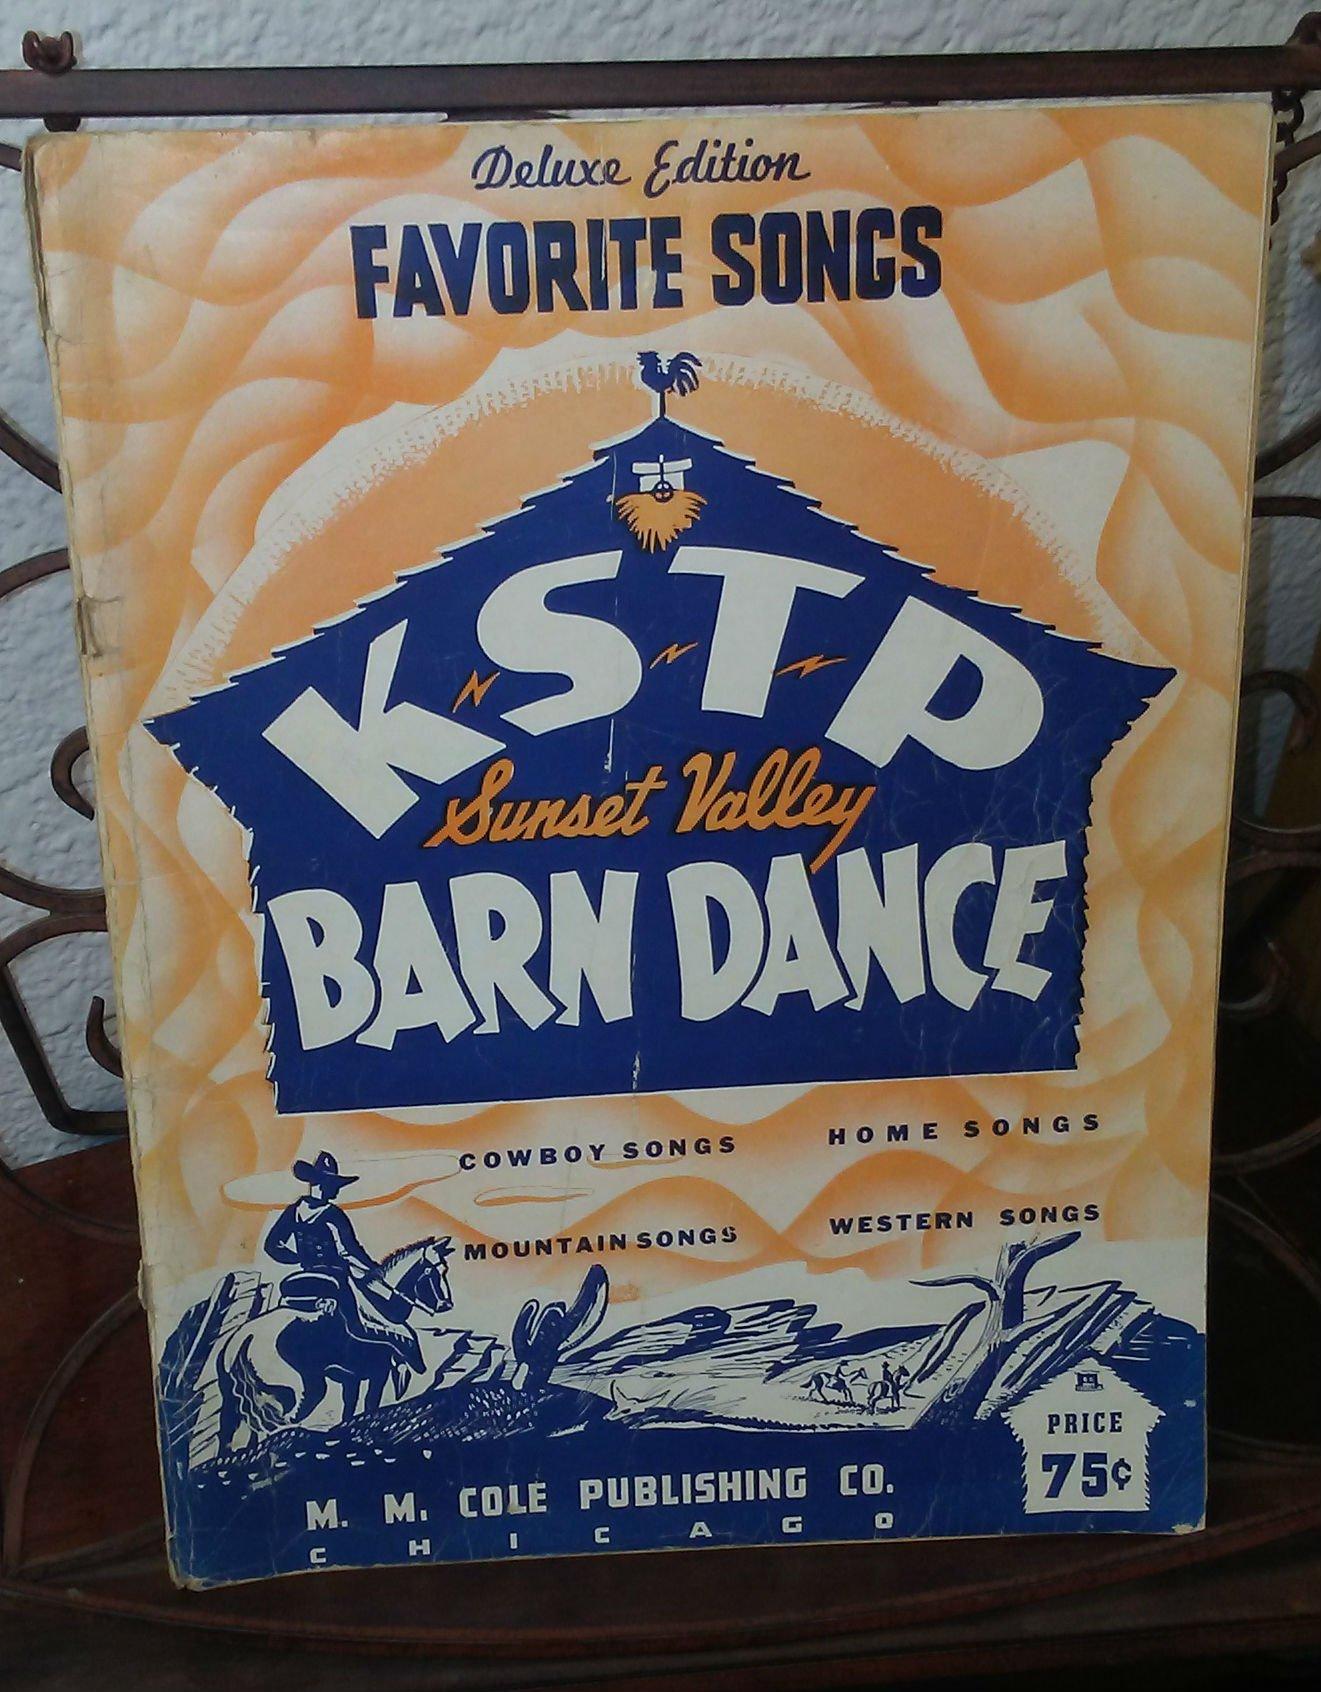 KSTP Sunset Valley Barn Dance: Deluxe Edition Favorite Songs